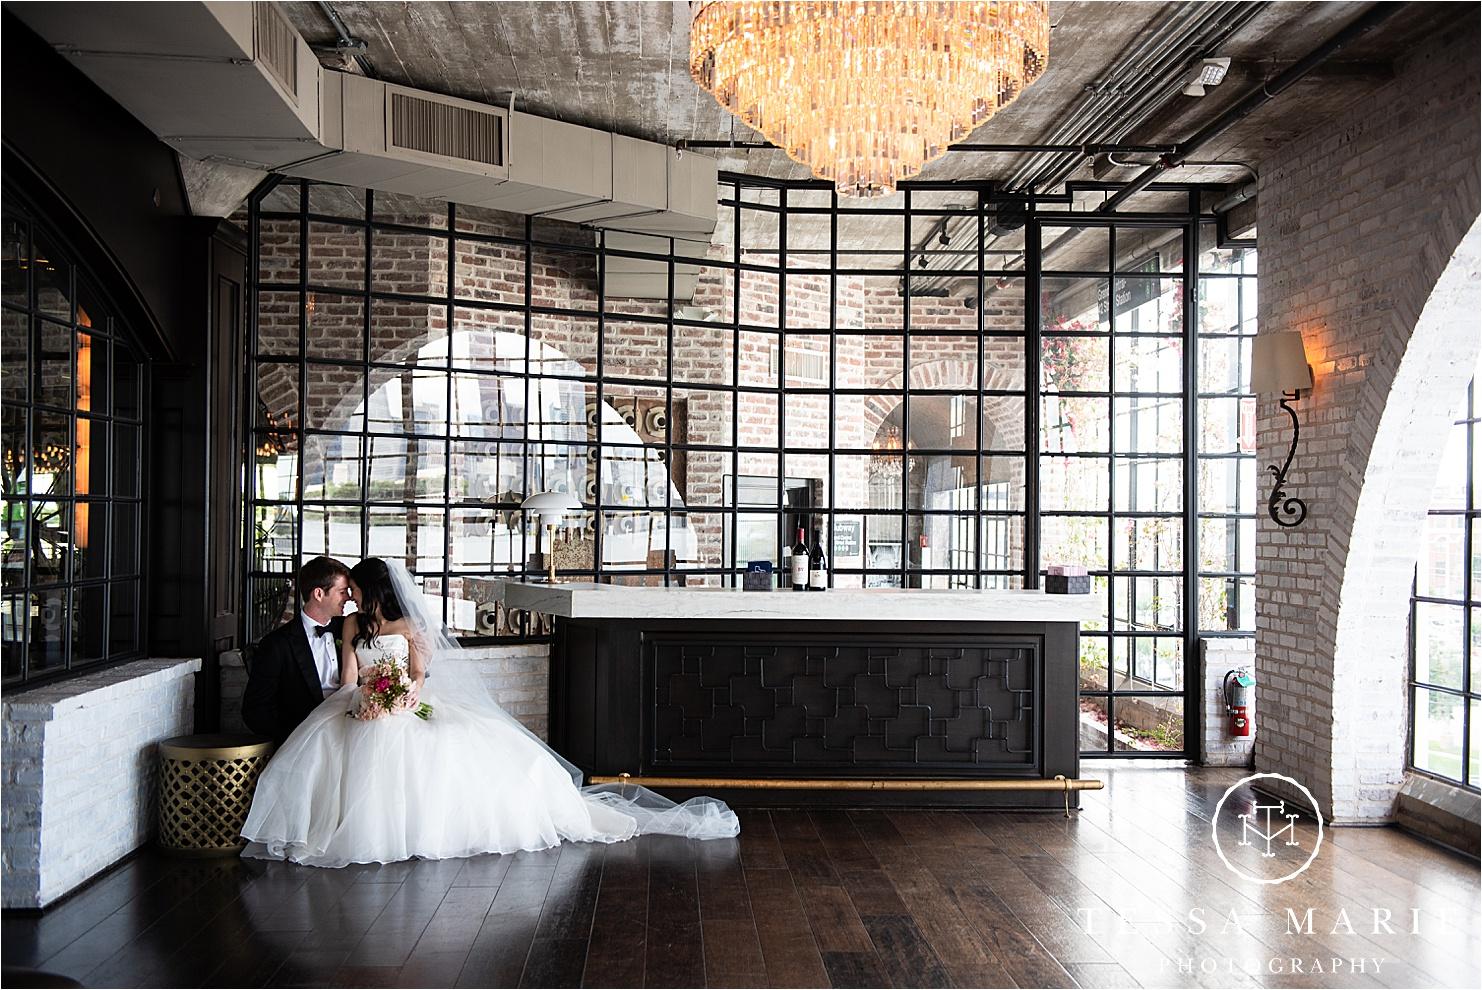 Tessa_marie_weddings_houston_wedding_photographer_The_astorian_0063.jpg